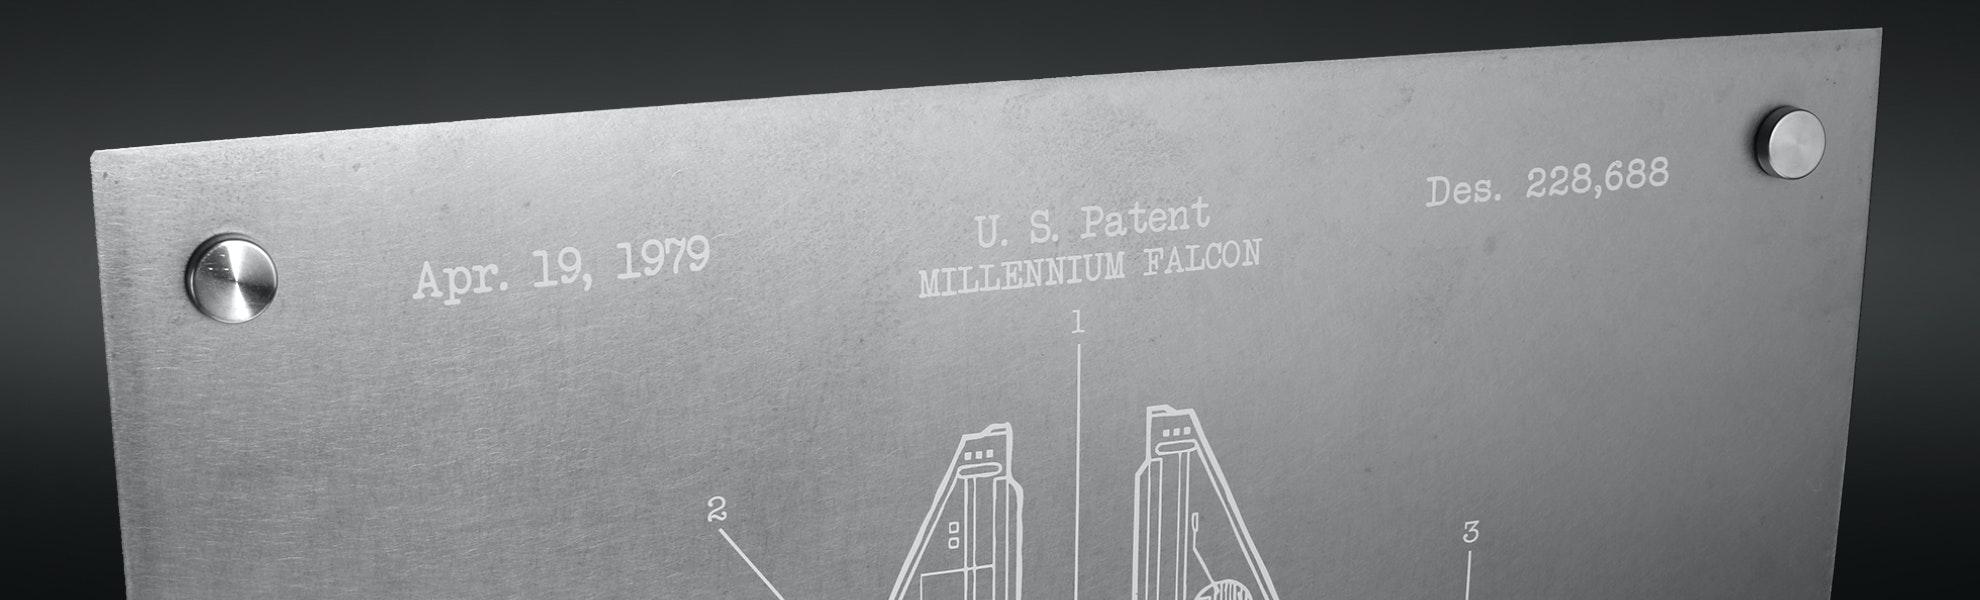 Inked & Screened Metal Patent Prints